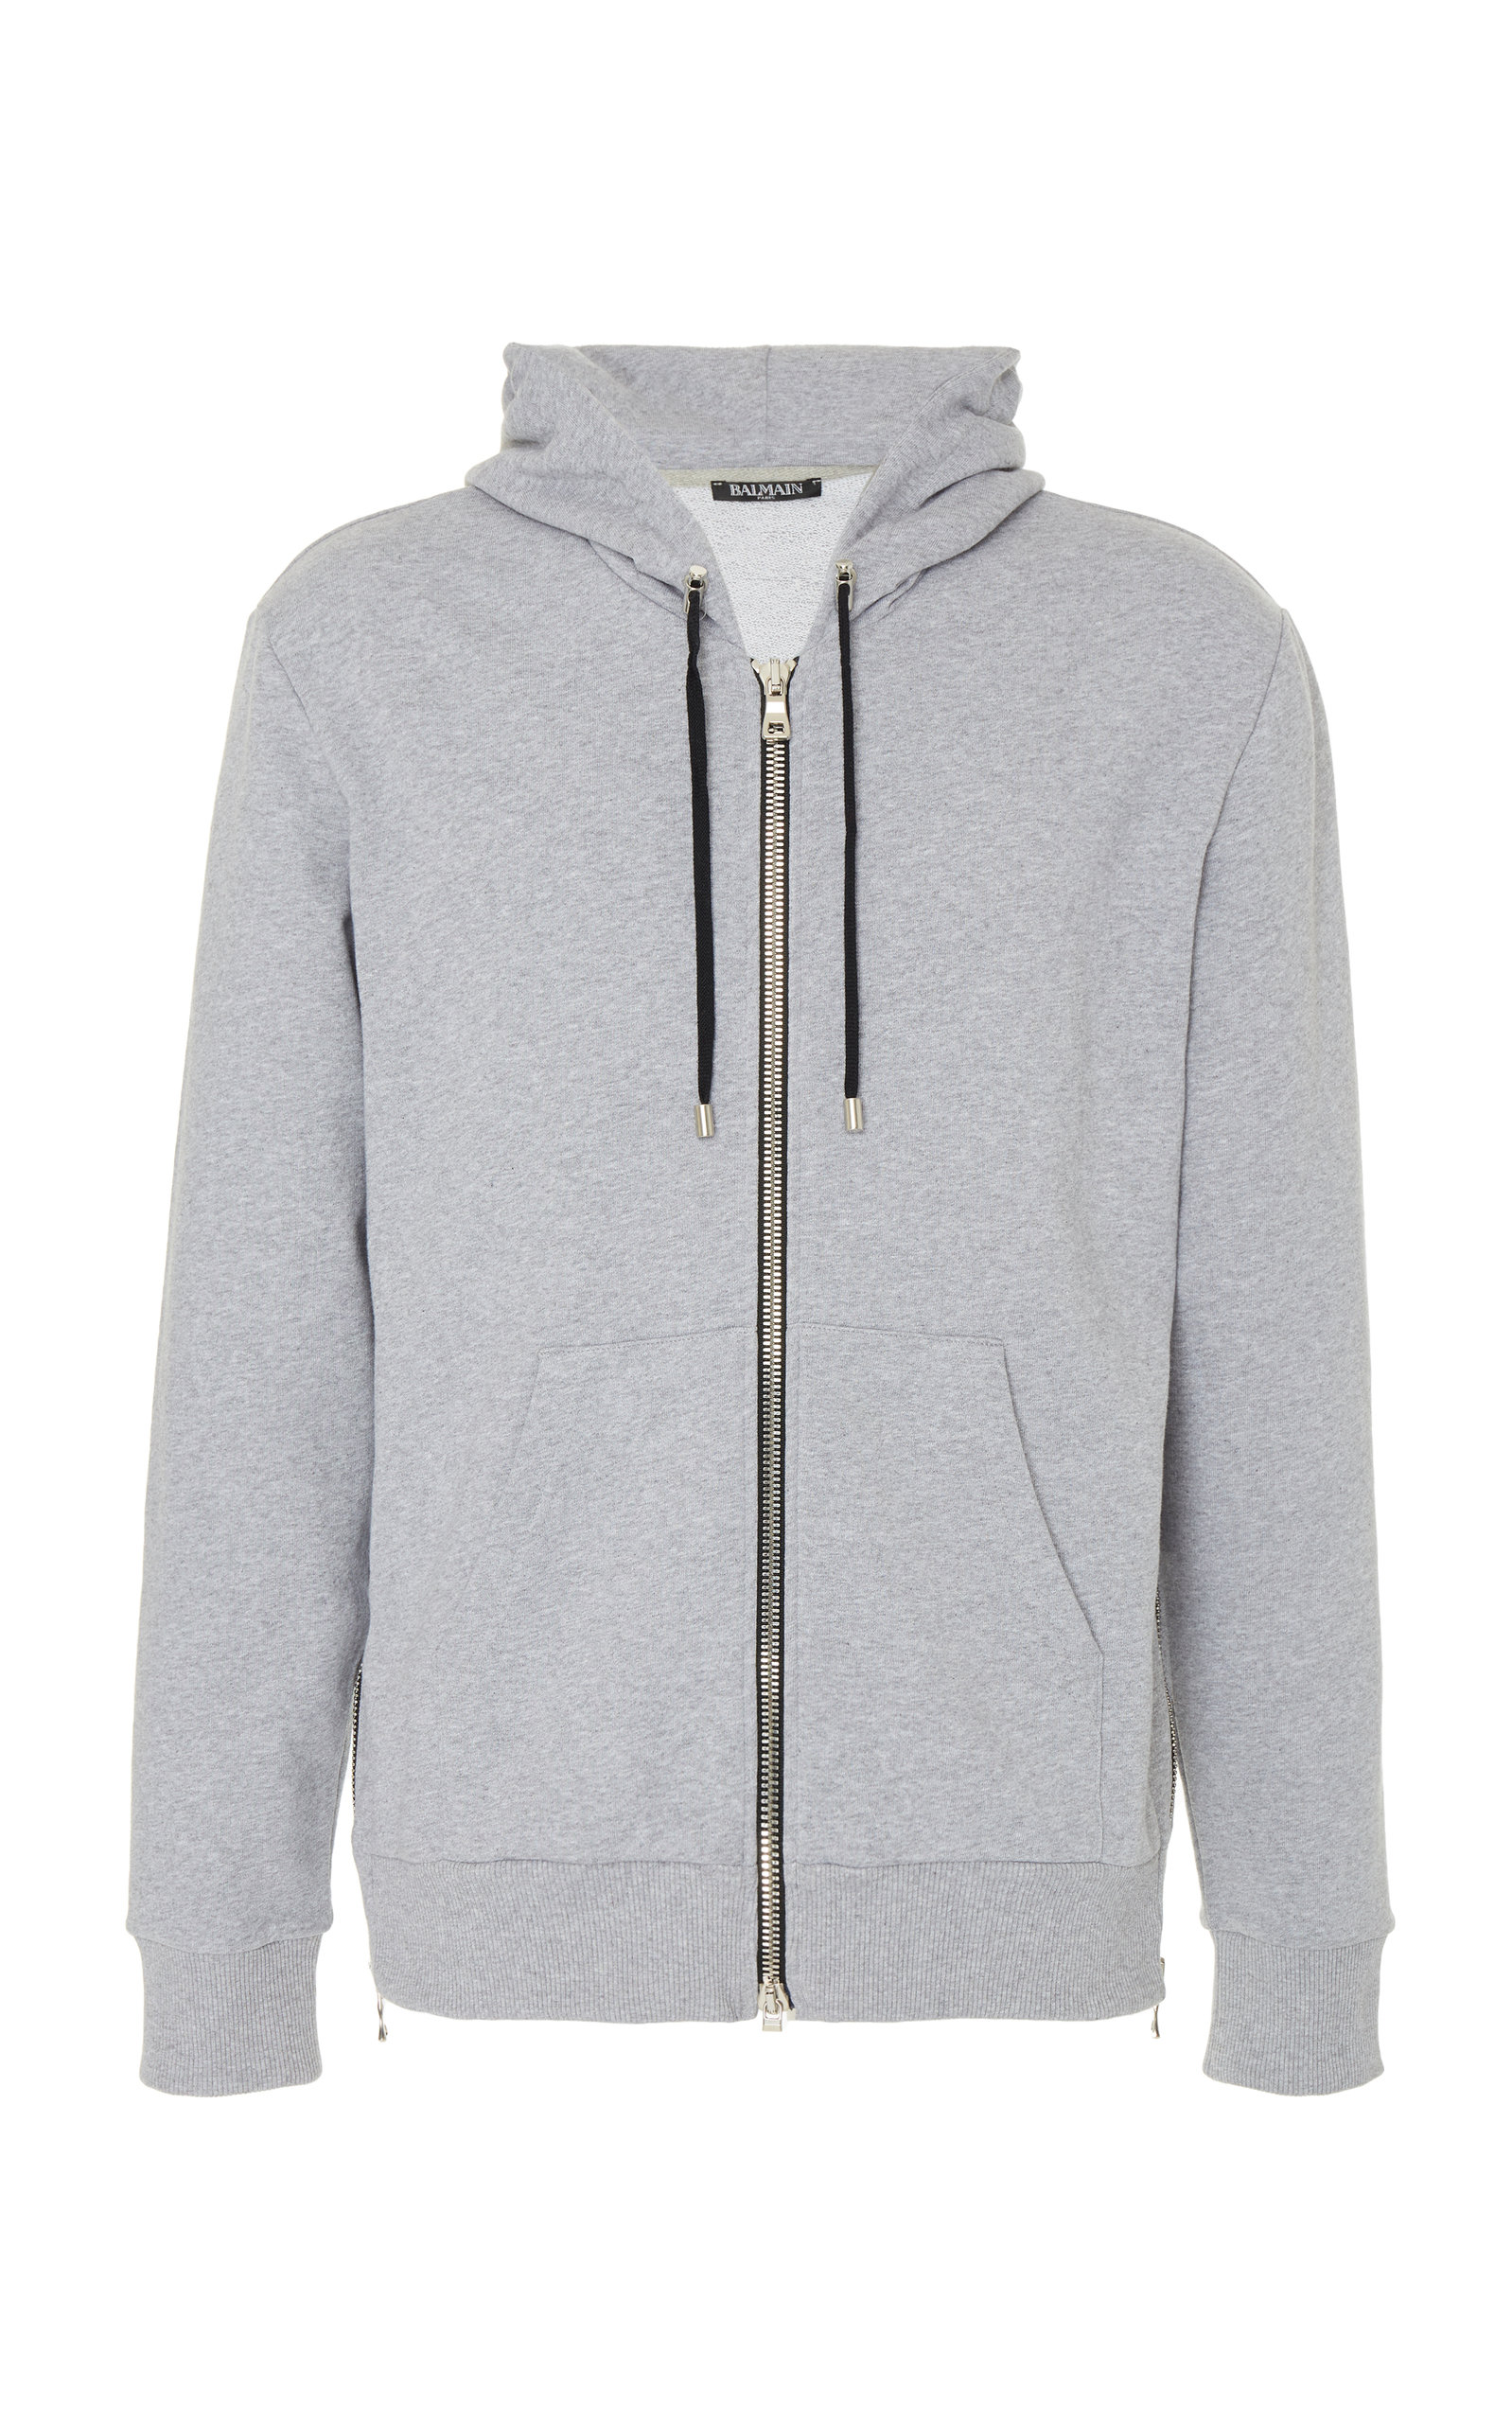 quality design 4c72d db118 Zip-Up Cotton Hoodie